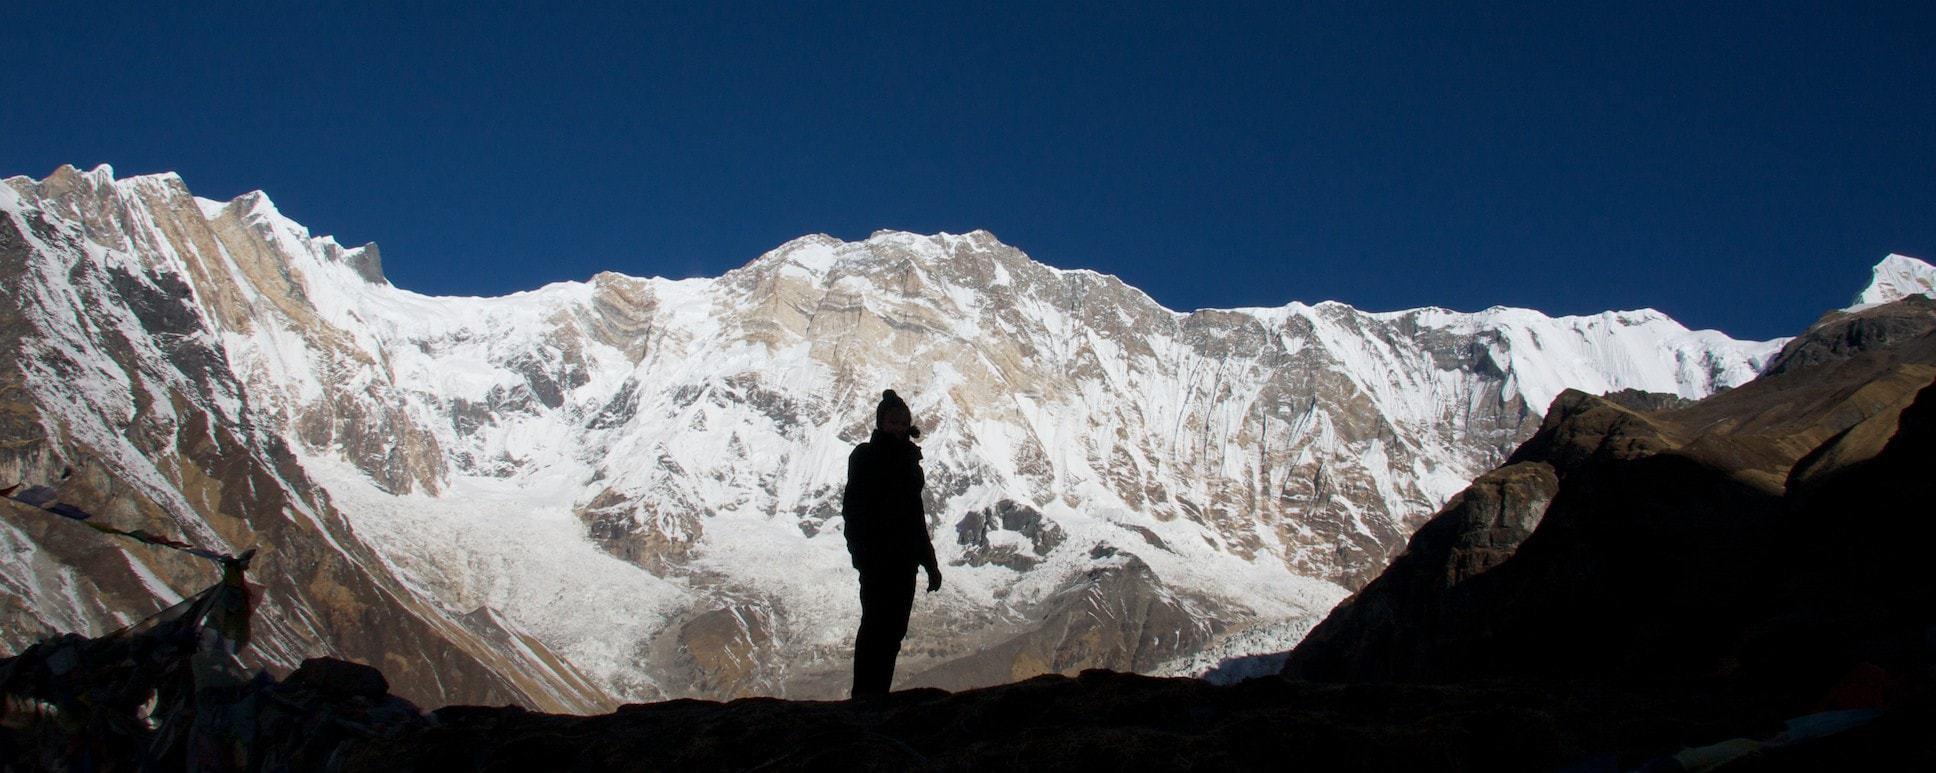 Trekking to Annapurna Base Camp - Our Honeymoon